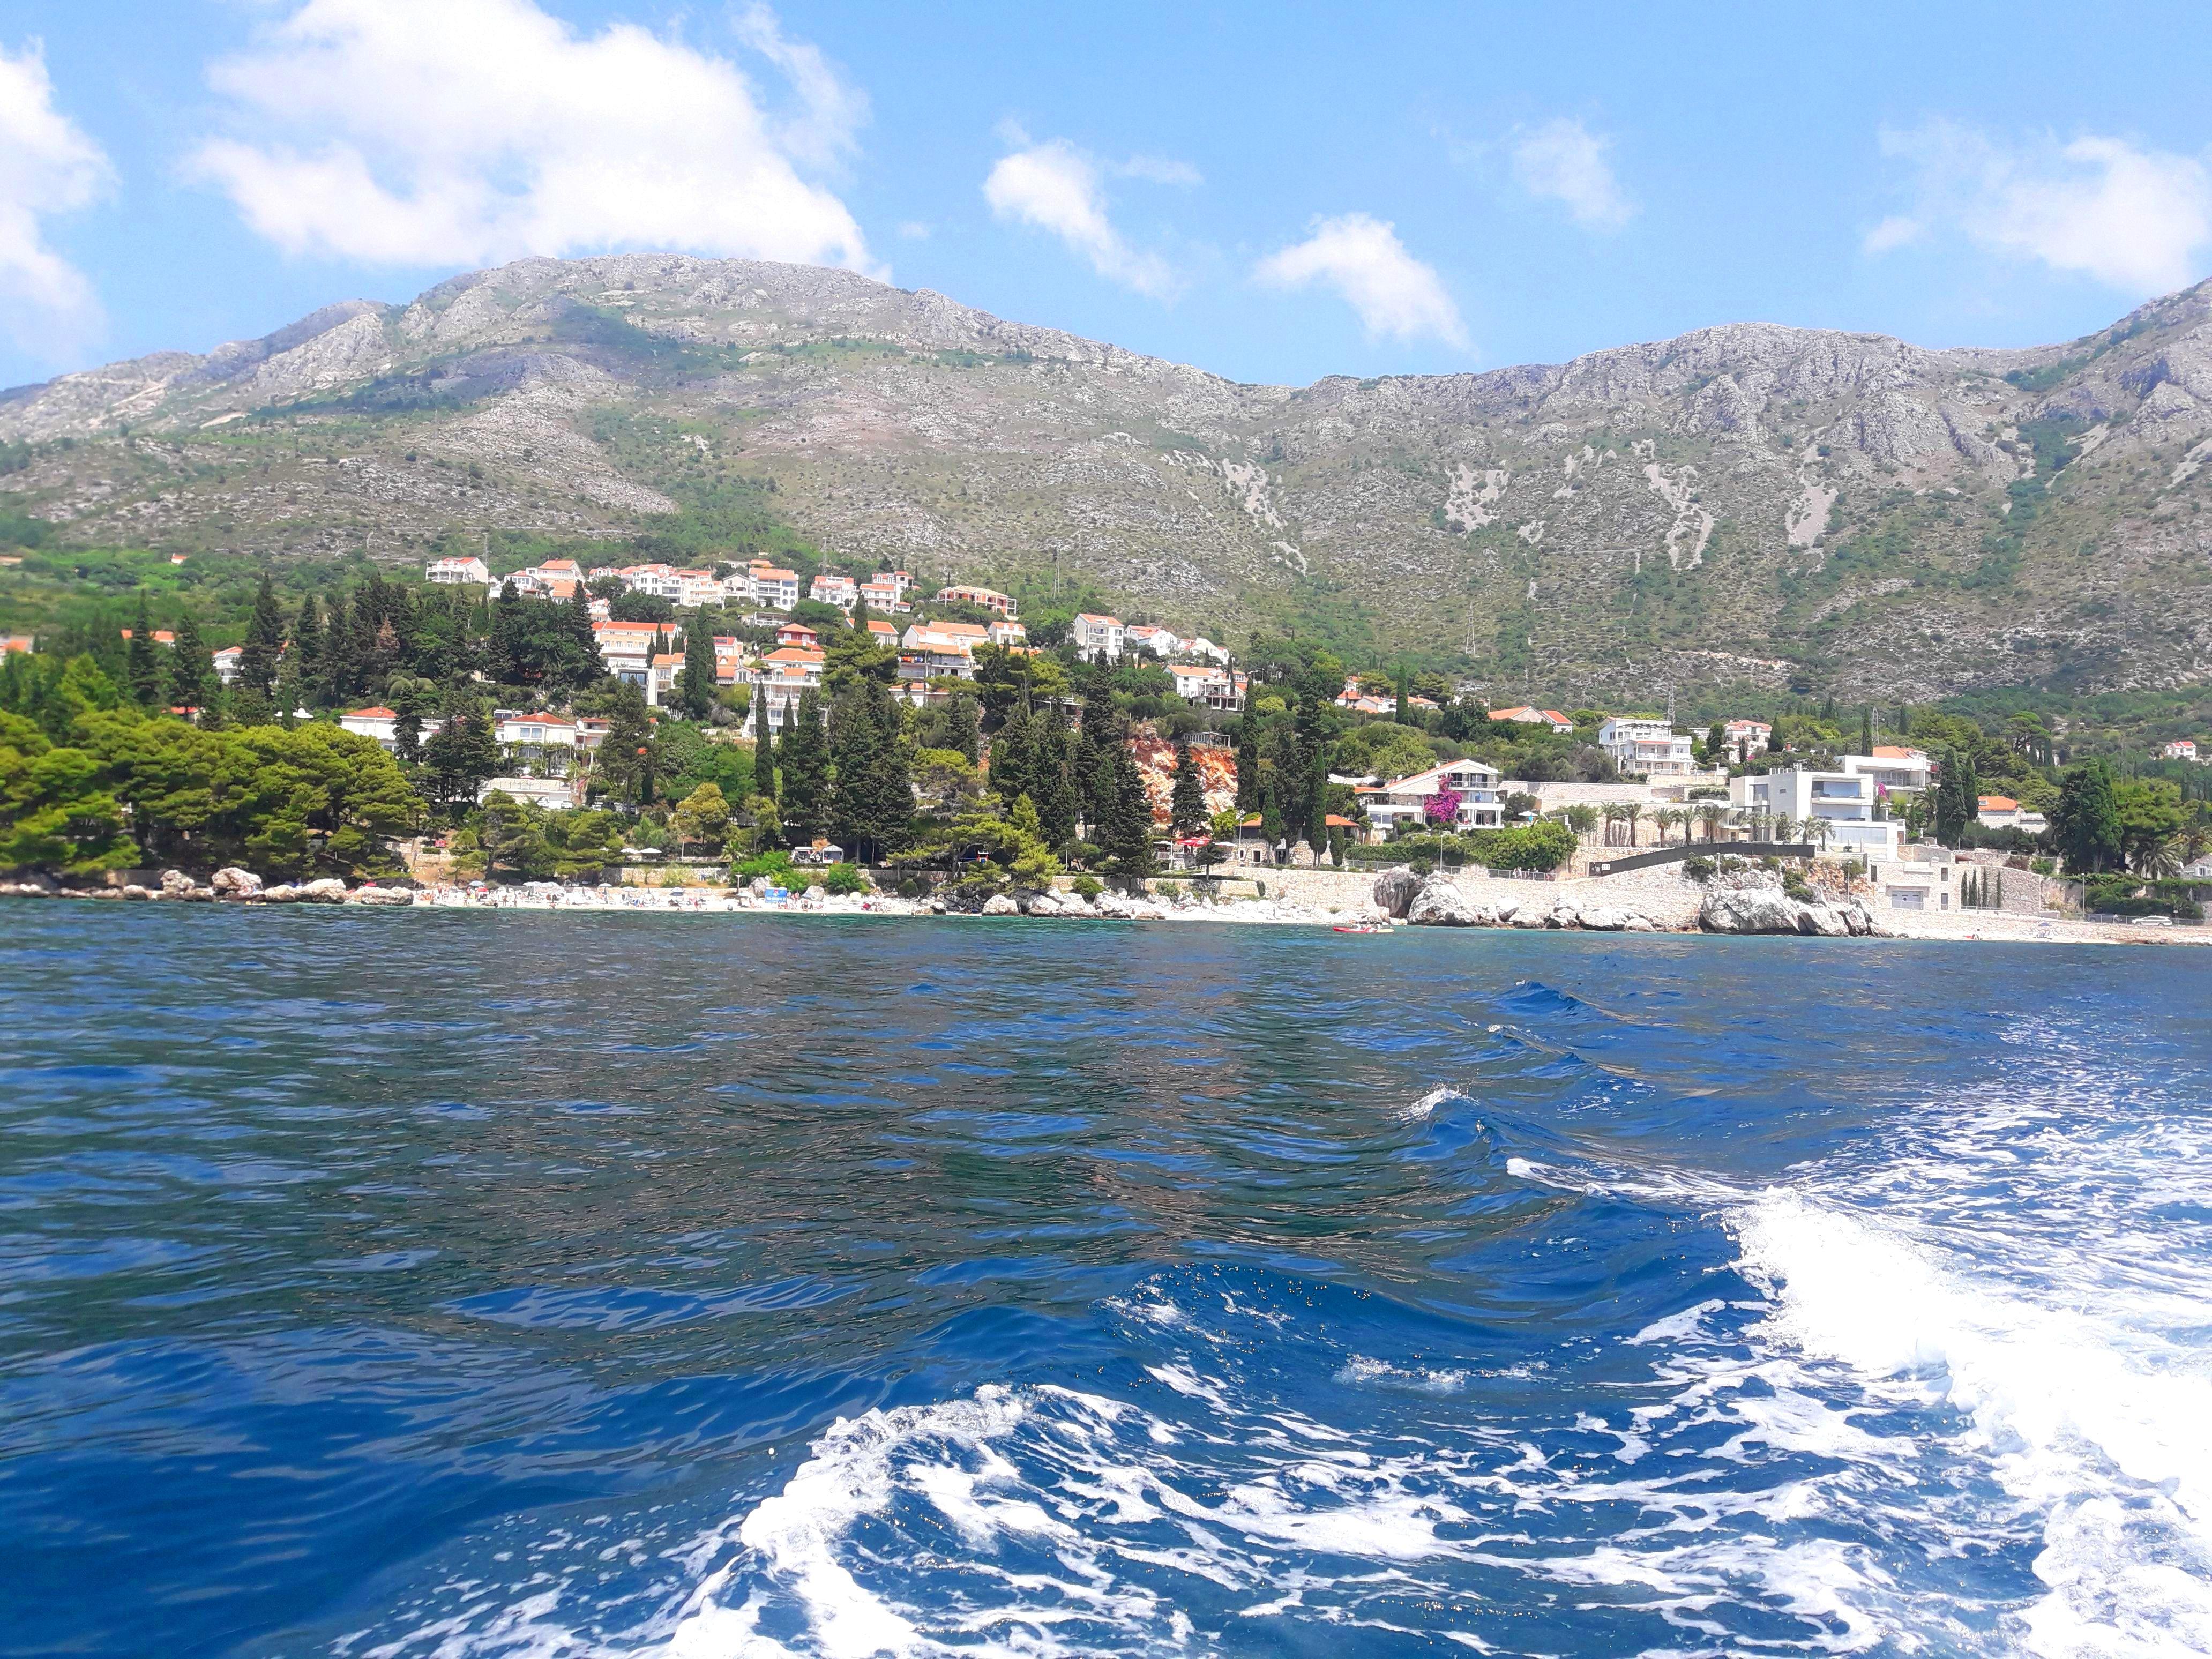 Dubrovnik Riviera (Zupa Dubrovacka)